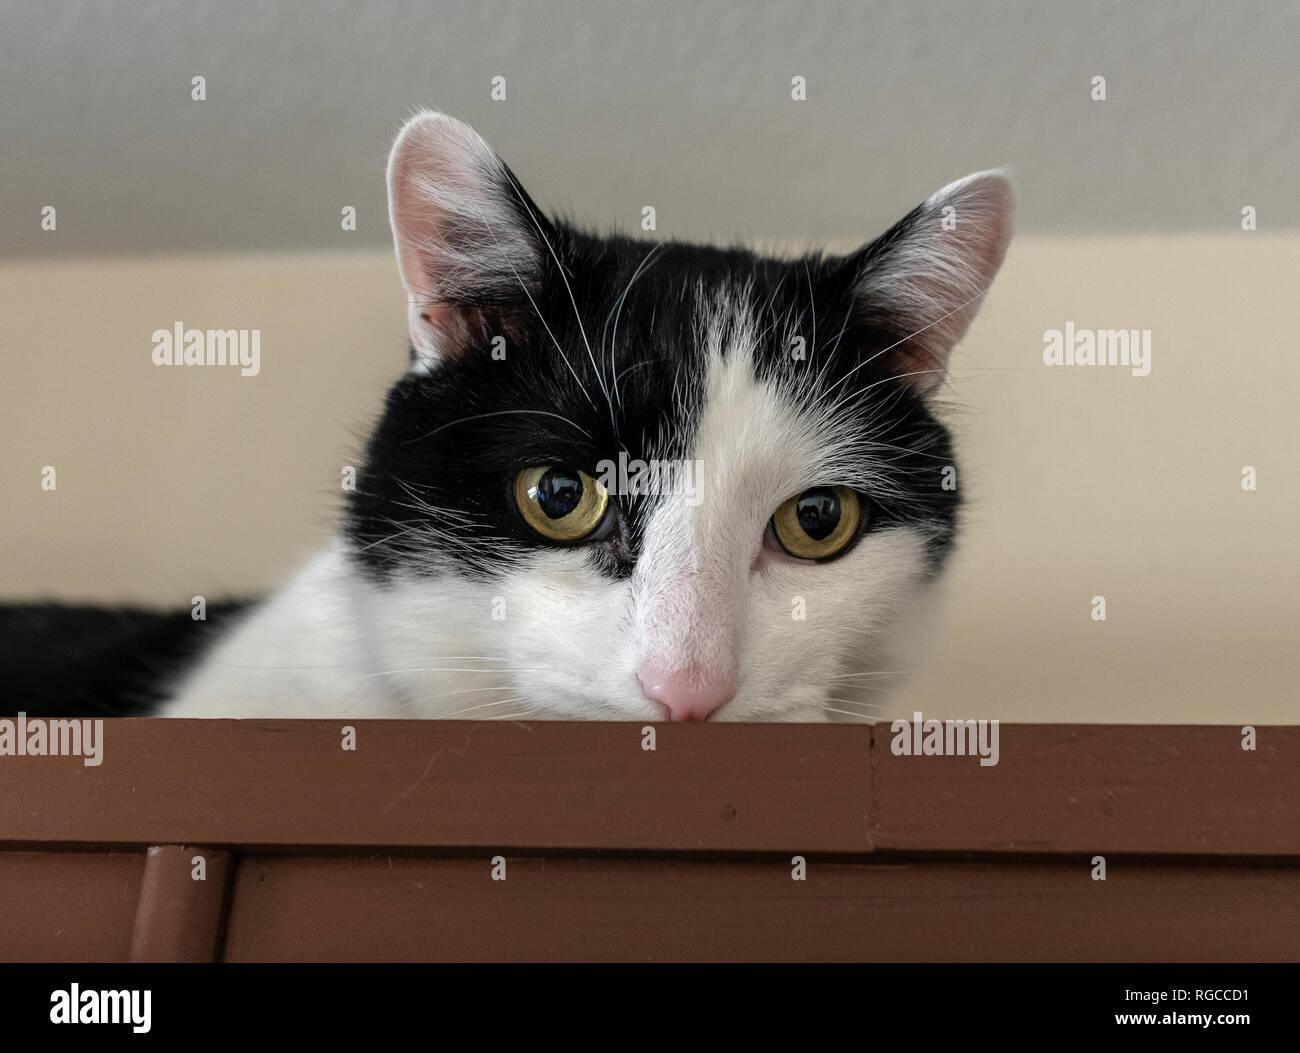 black & white cat face - Stock Image